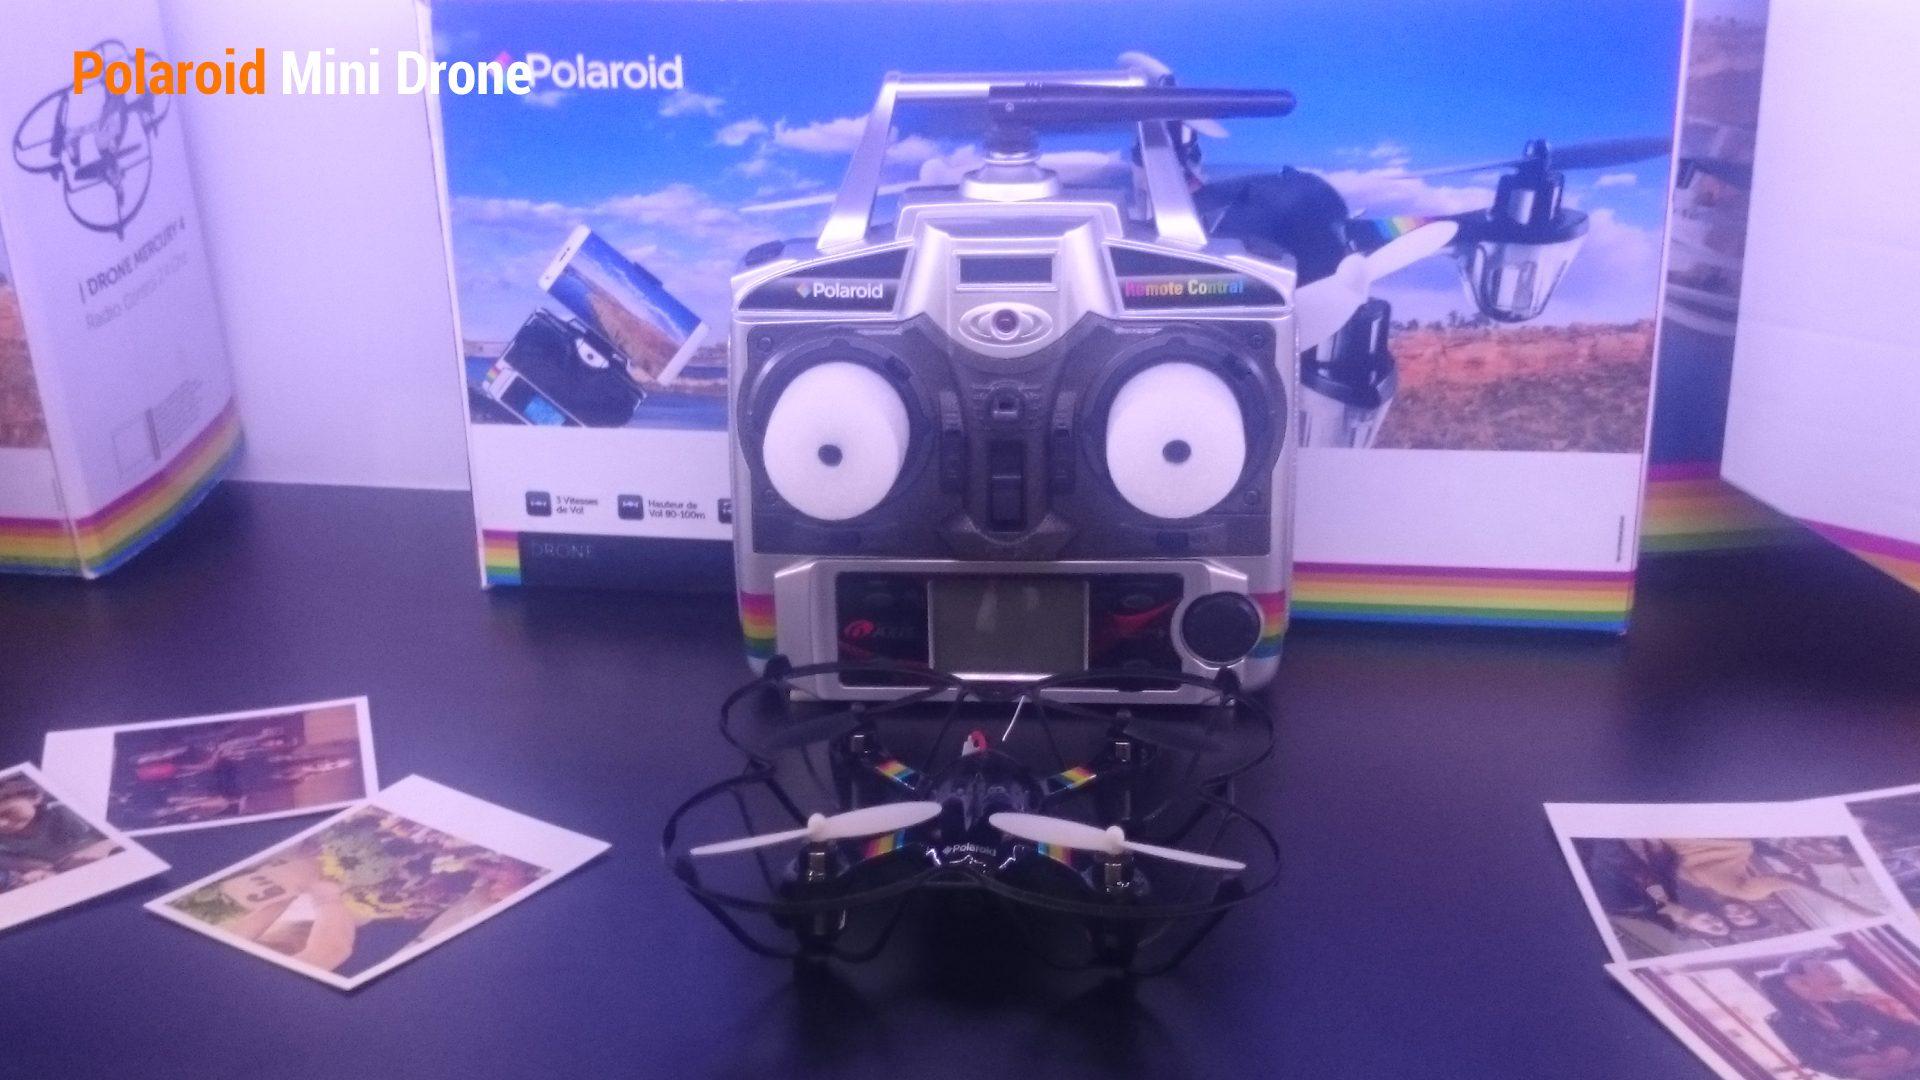 Polaroid-Mini-Drone2